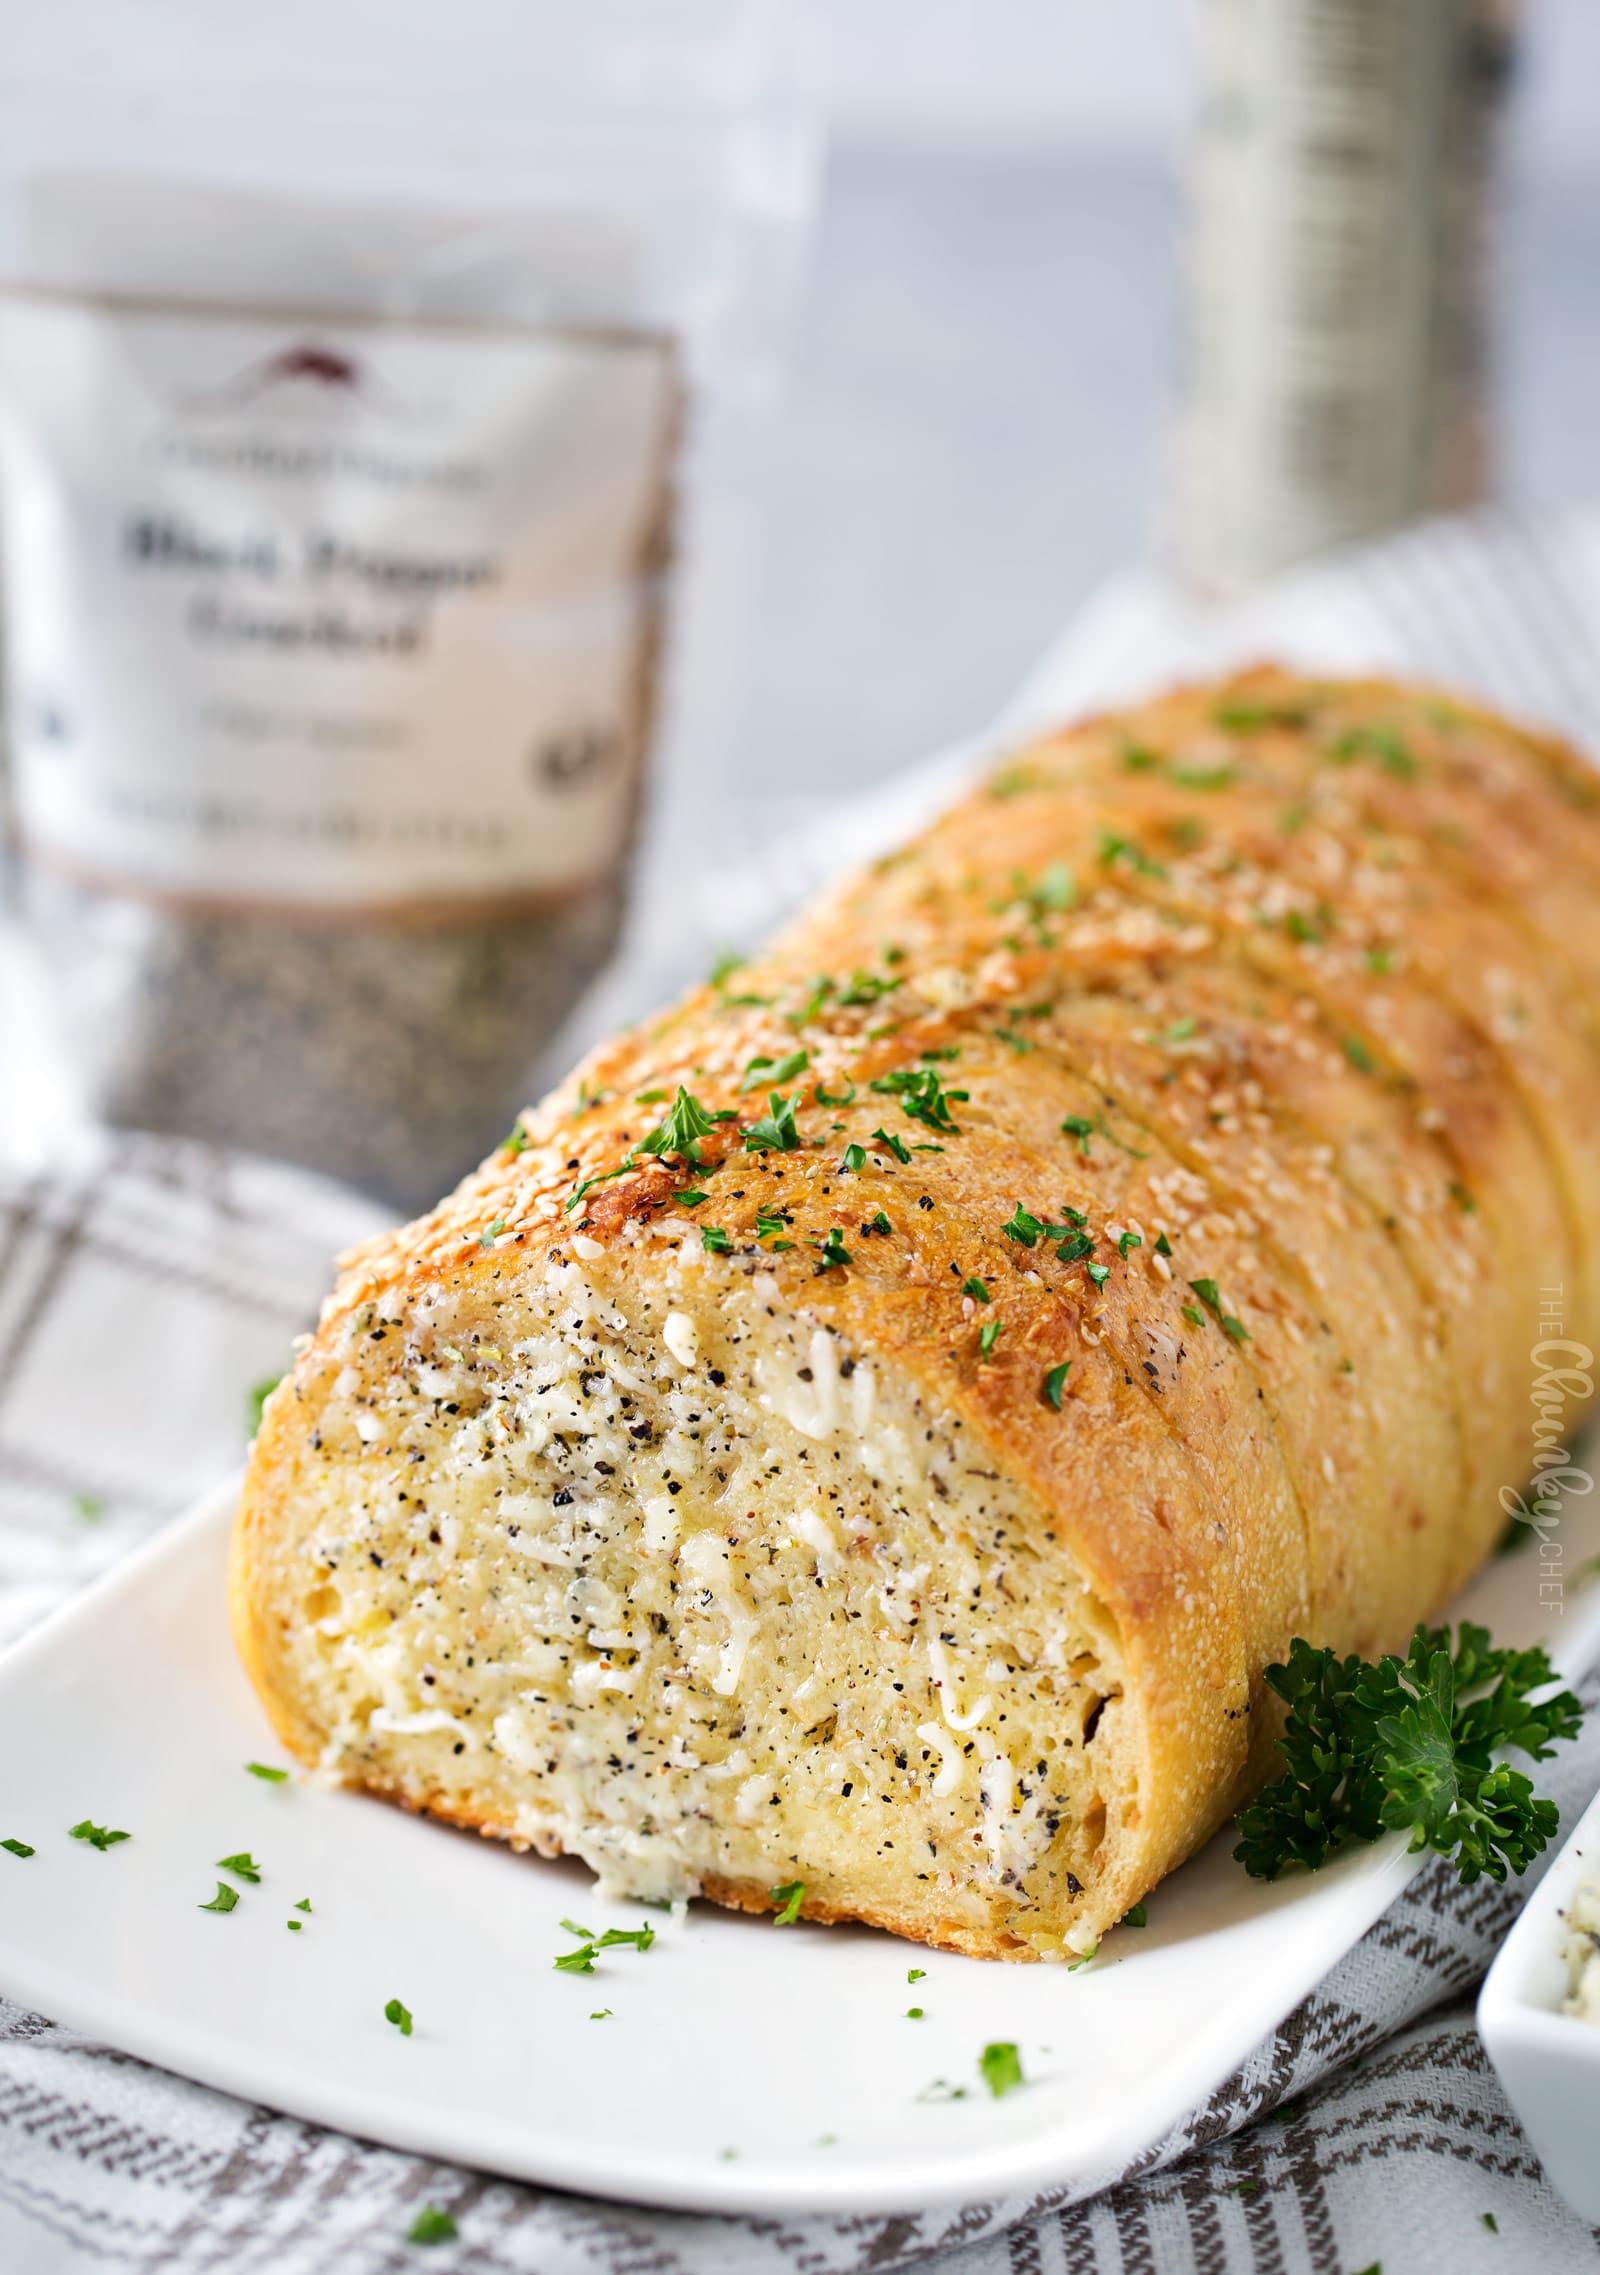 Make Garlic Bread  Homemade Garlic Bread with a cheesy option The Chunky Chef